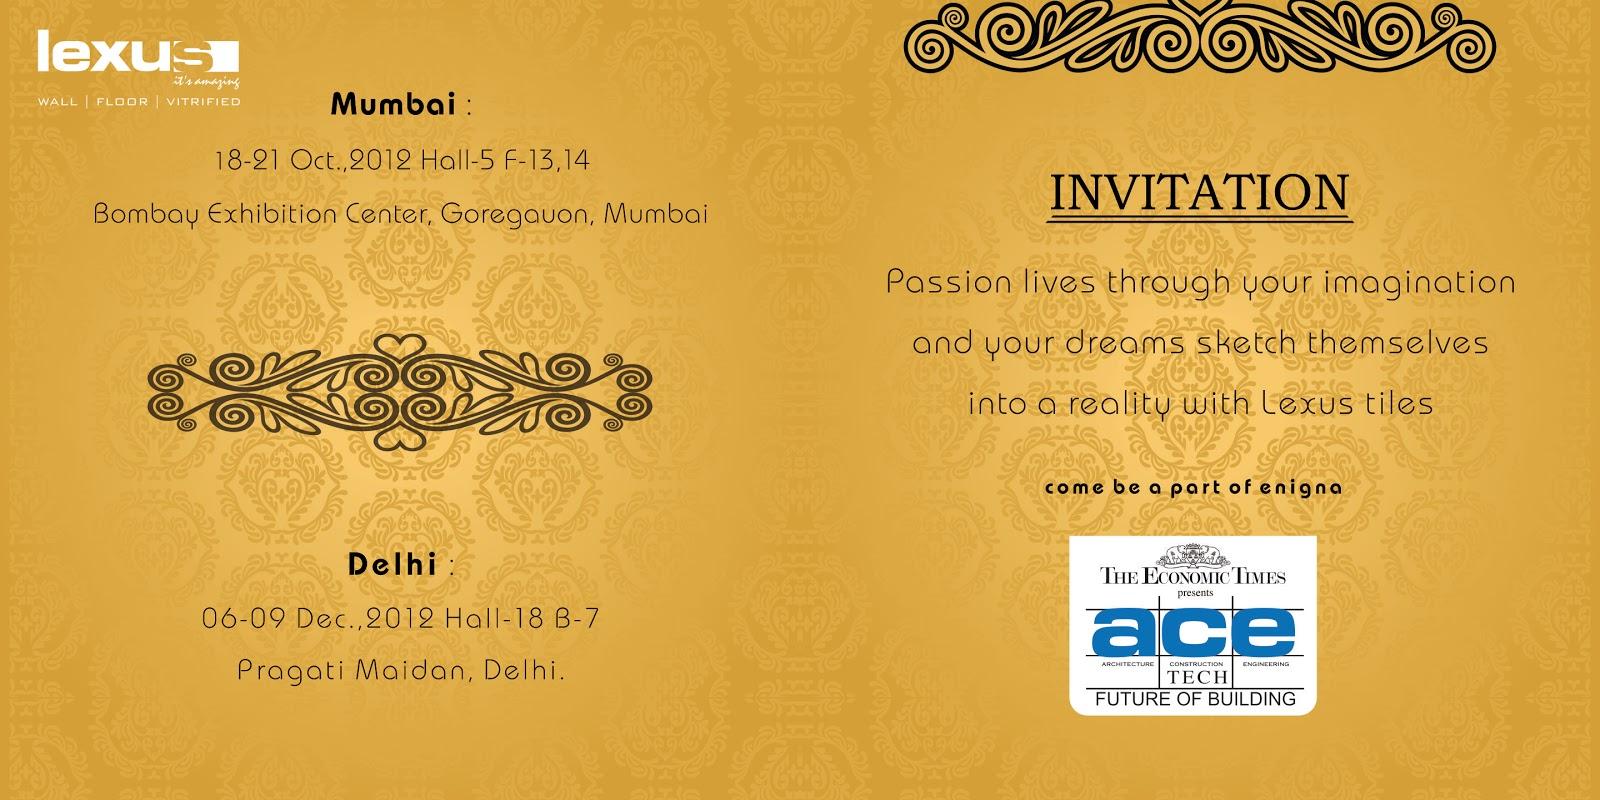 Branding the need of every company acetech 2012 mumbai invitation stall design 3d stopboris Choice Image